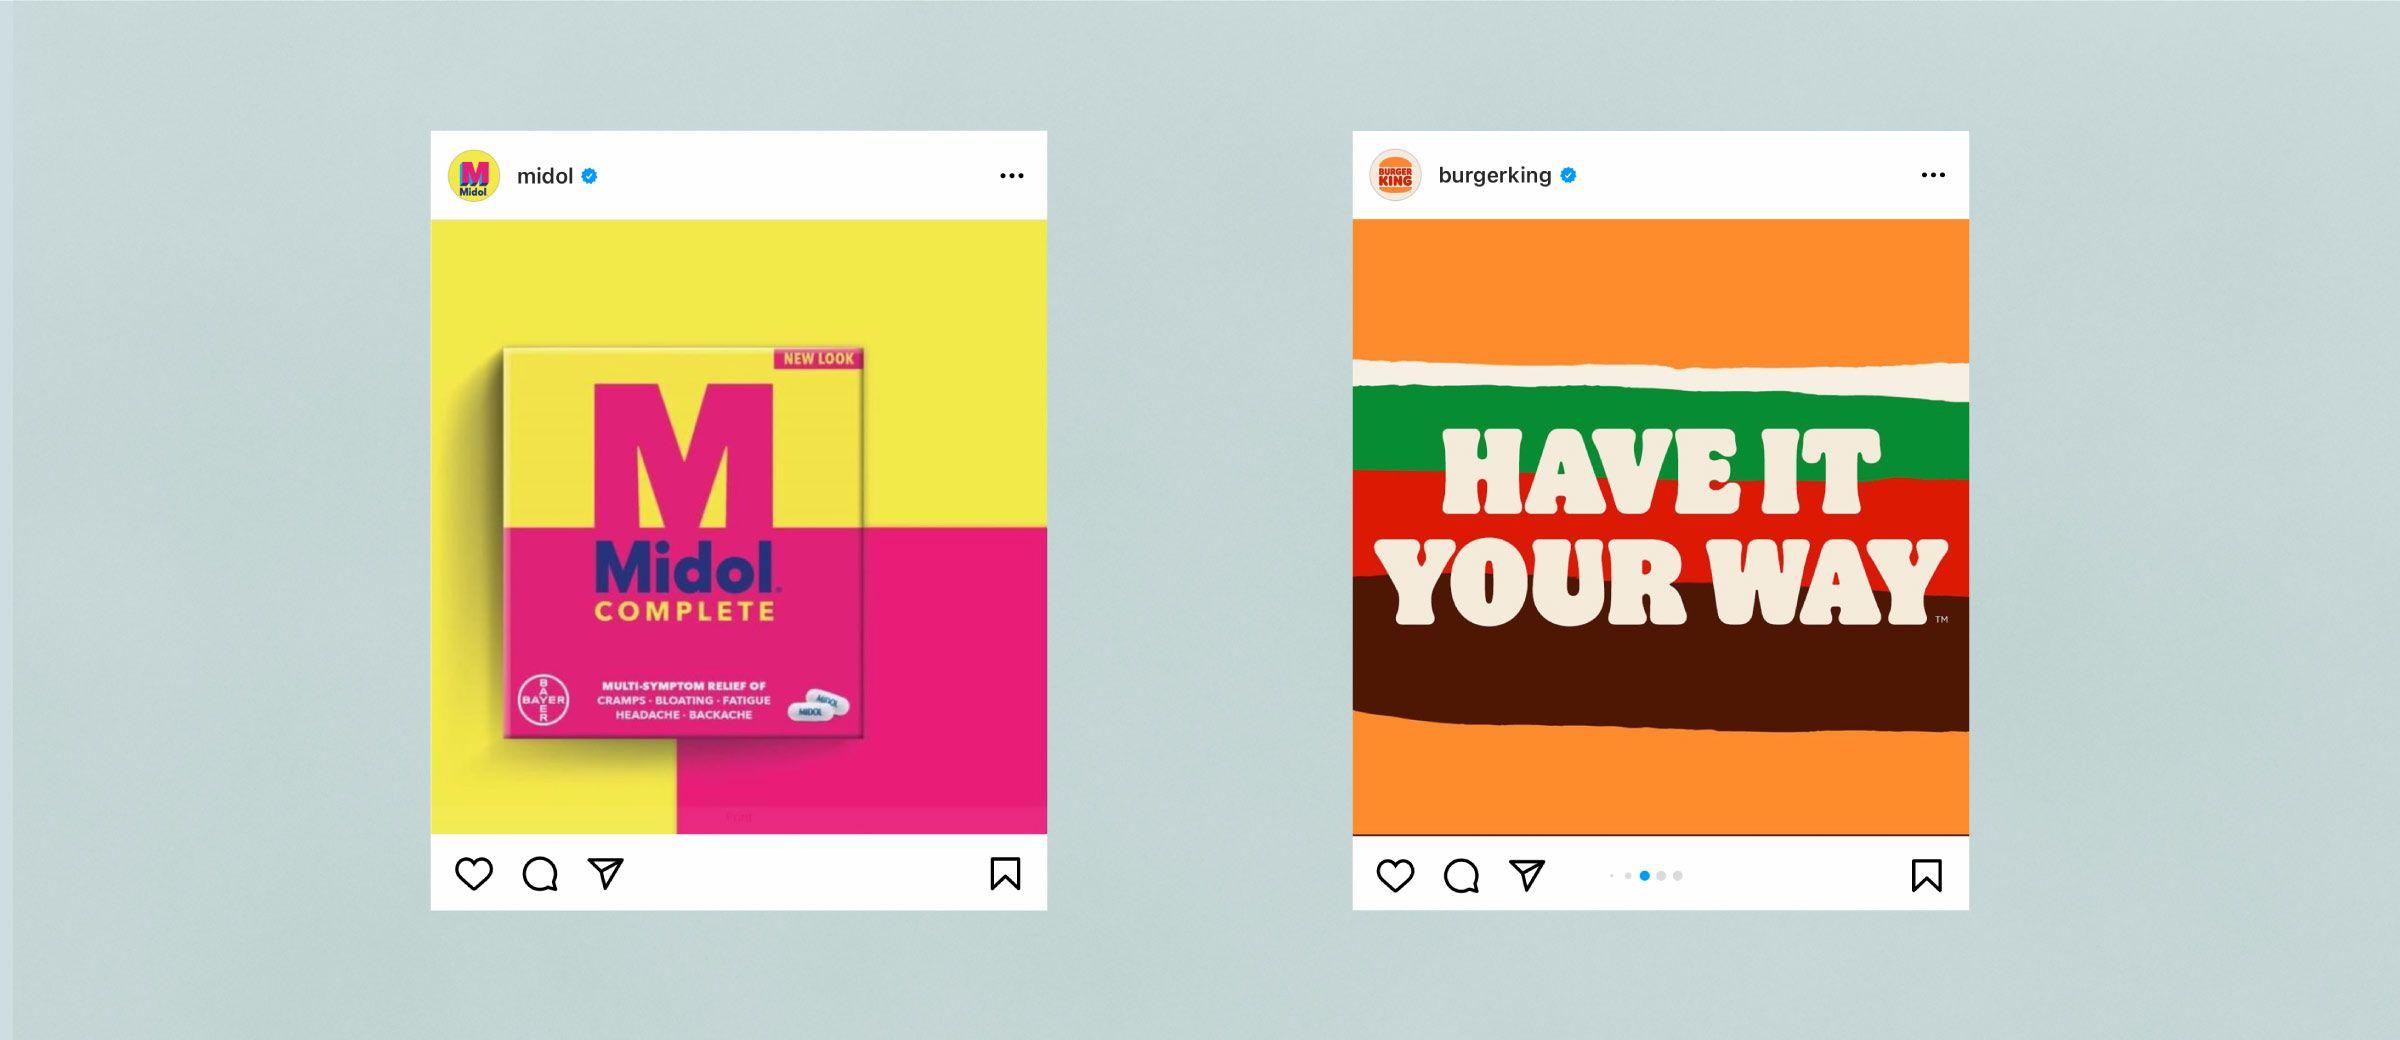 PLANOLY-Blog-Post--2021-Design-Trends-Img5